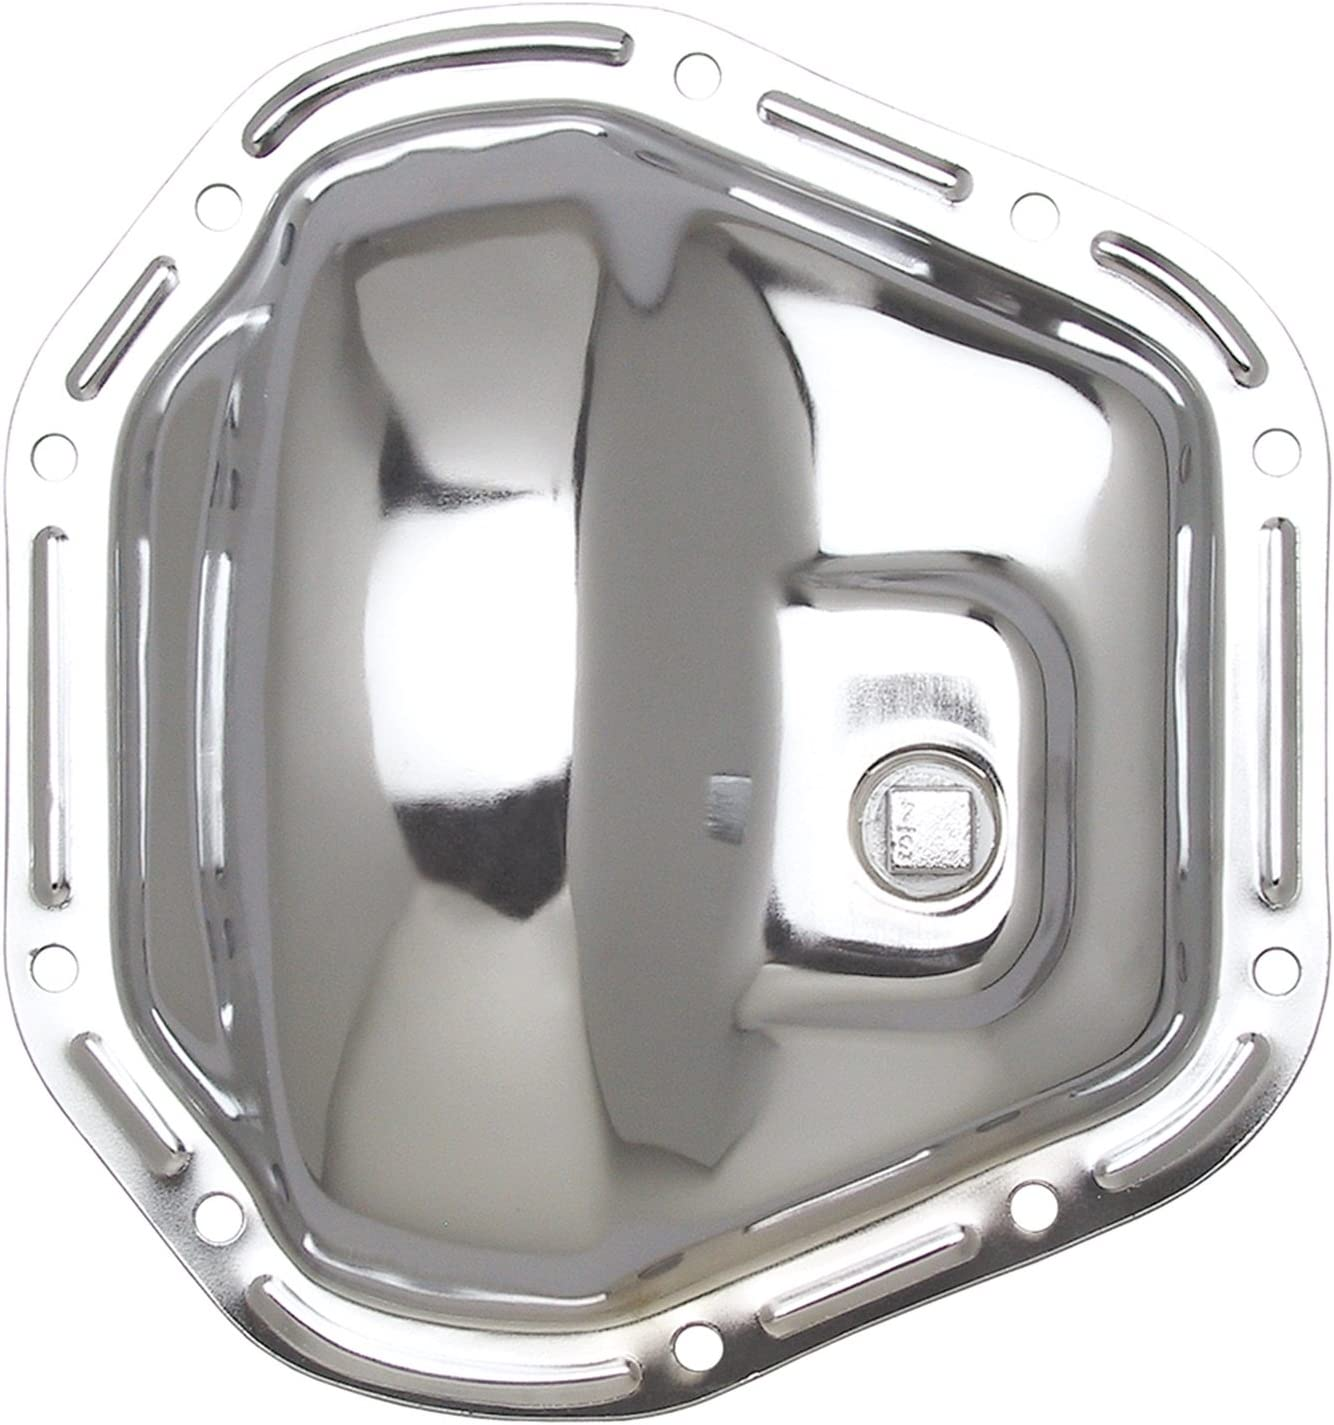 Trans-Dapt 4816 Chrome Differential Cover